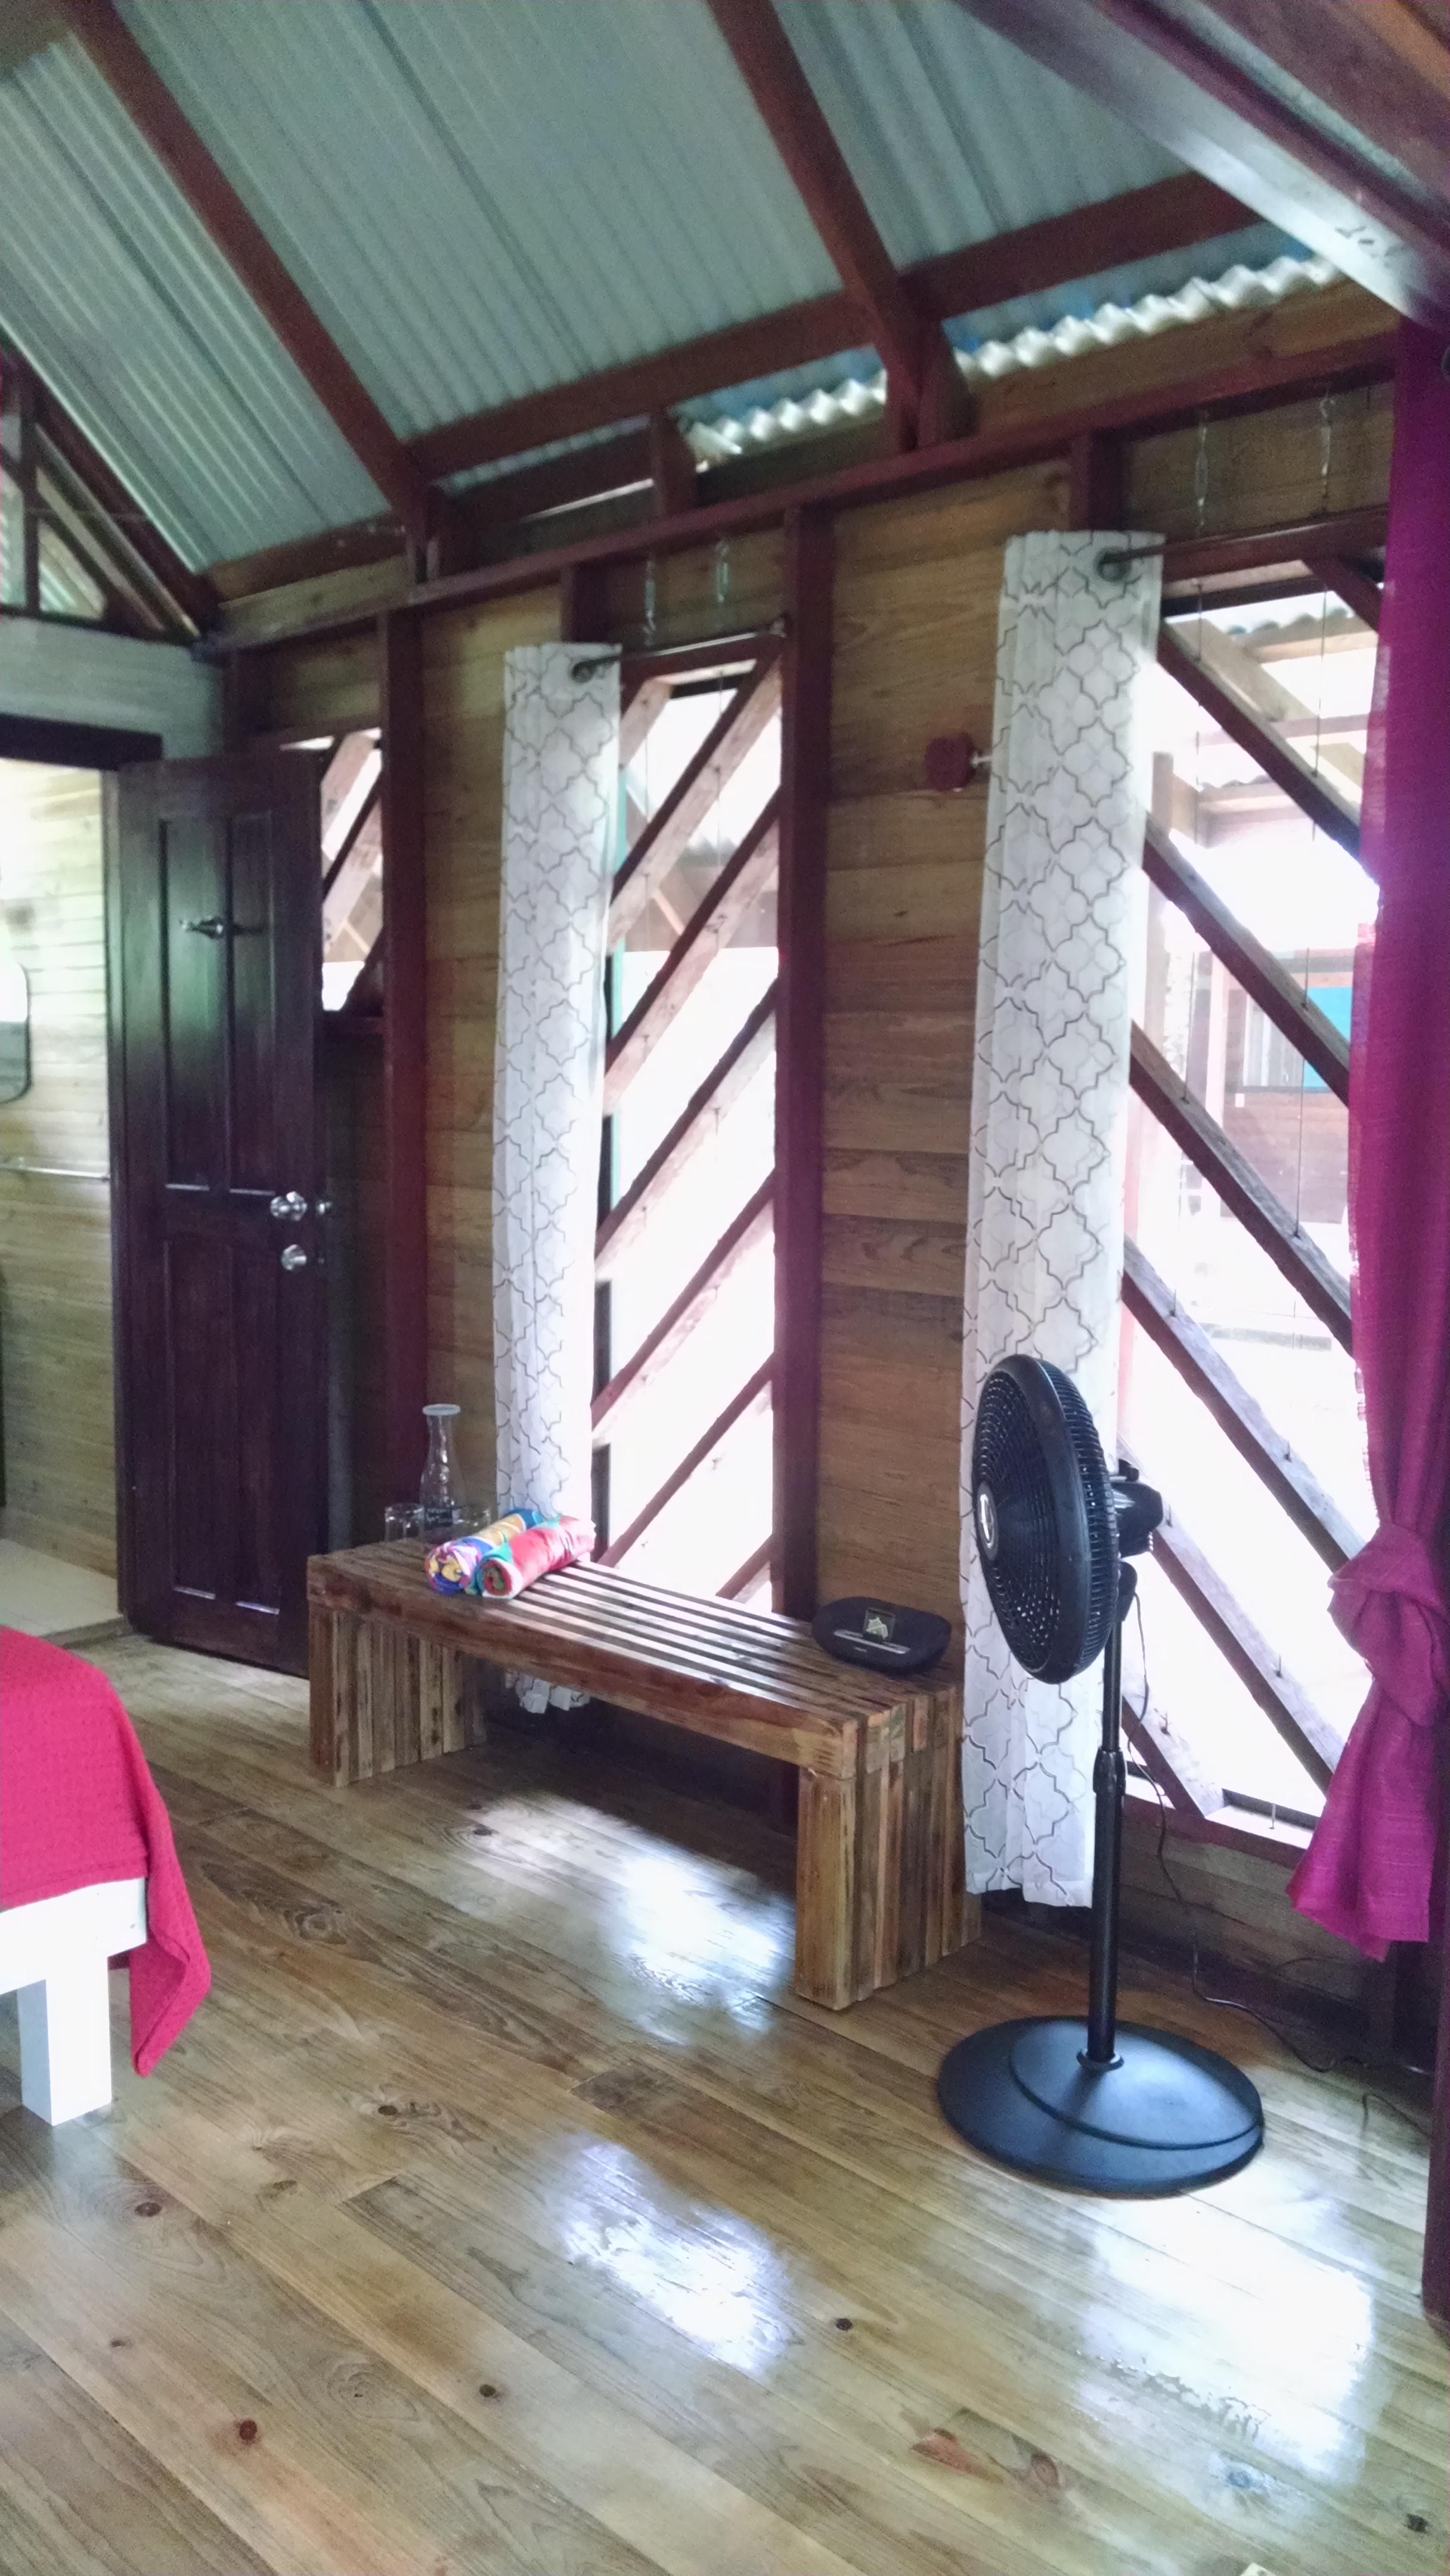 Tree Cabin - custom handmade bench, beach towels and floor fan to keep you comfy.